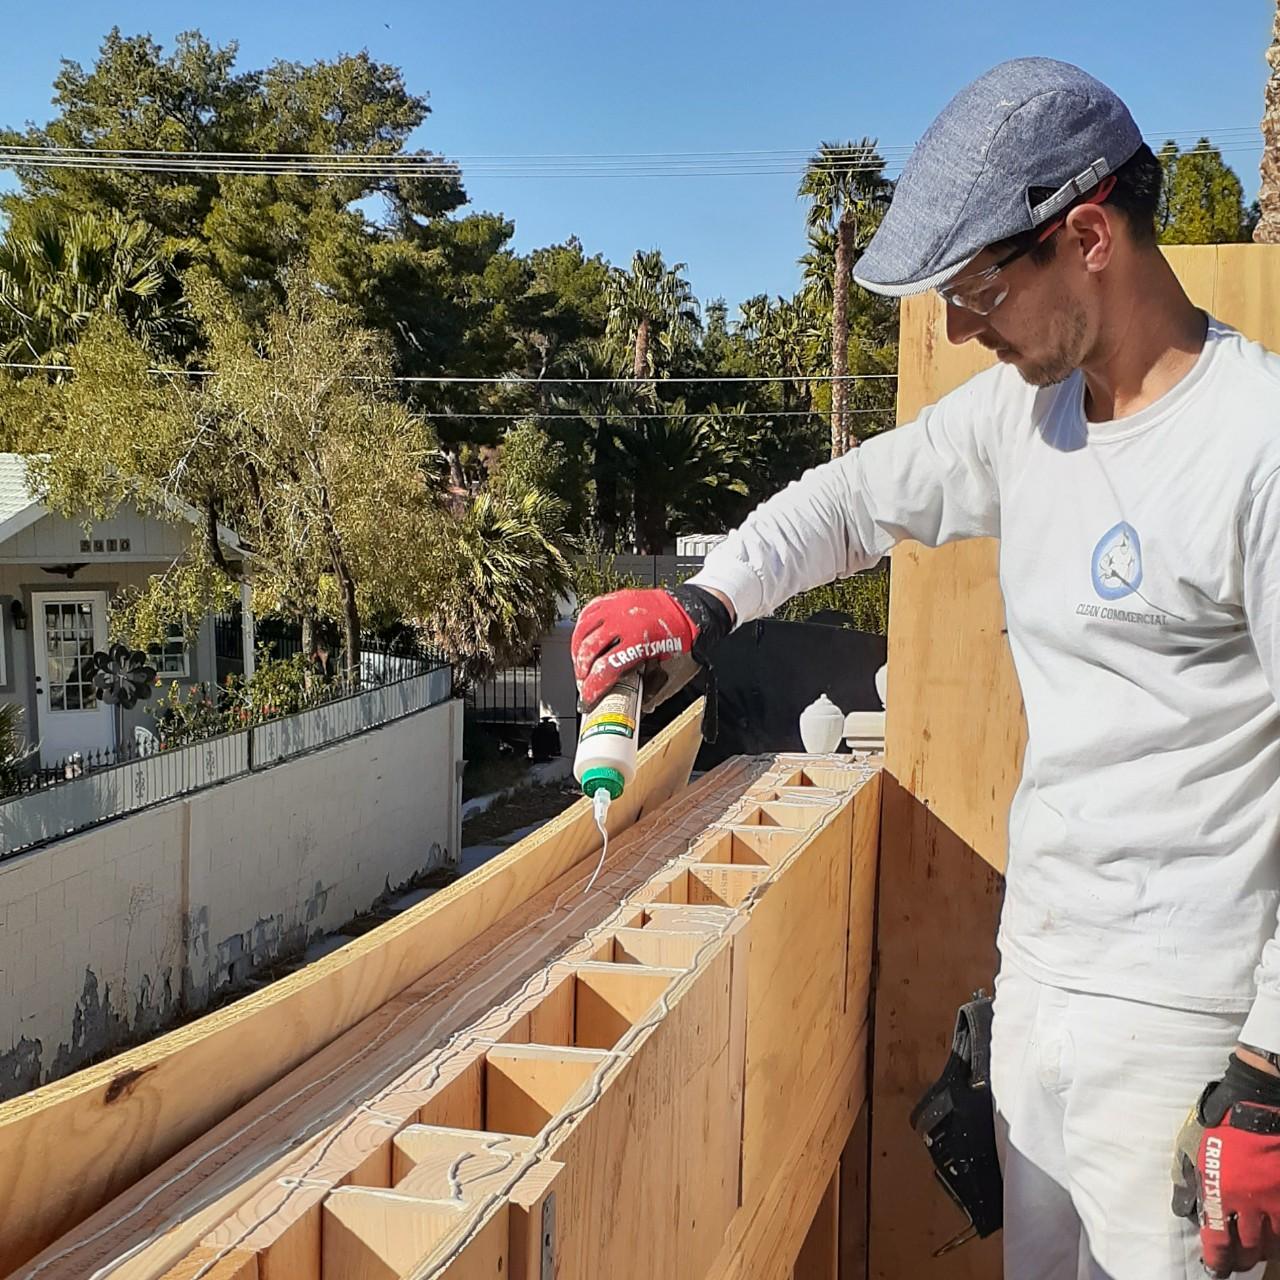 carpentry-wood-framing-second-floor-home-addition--framing-69